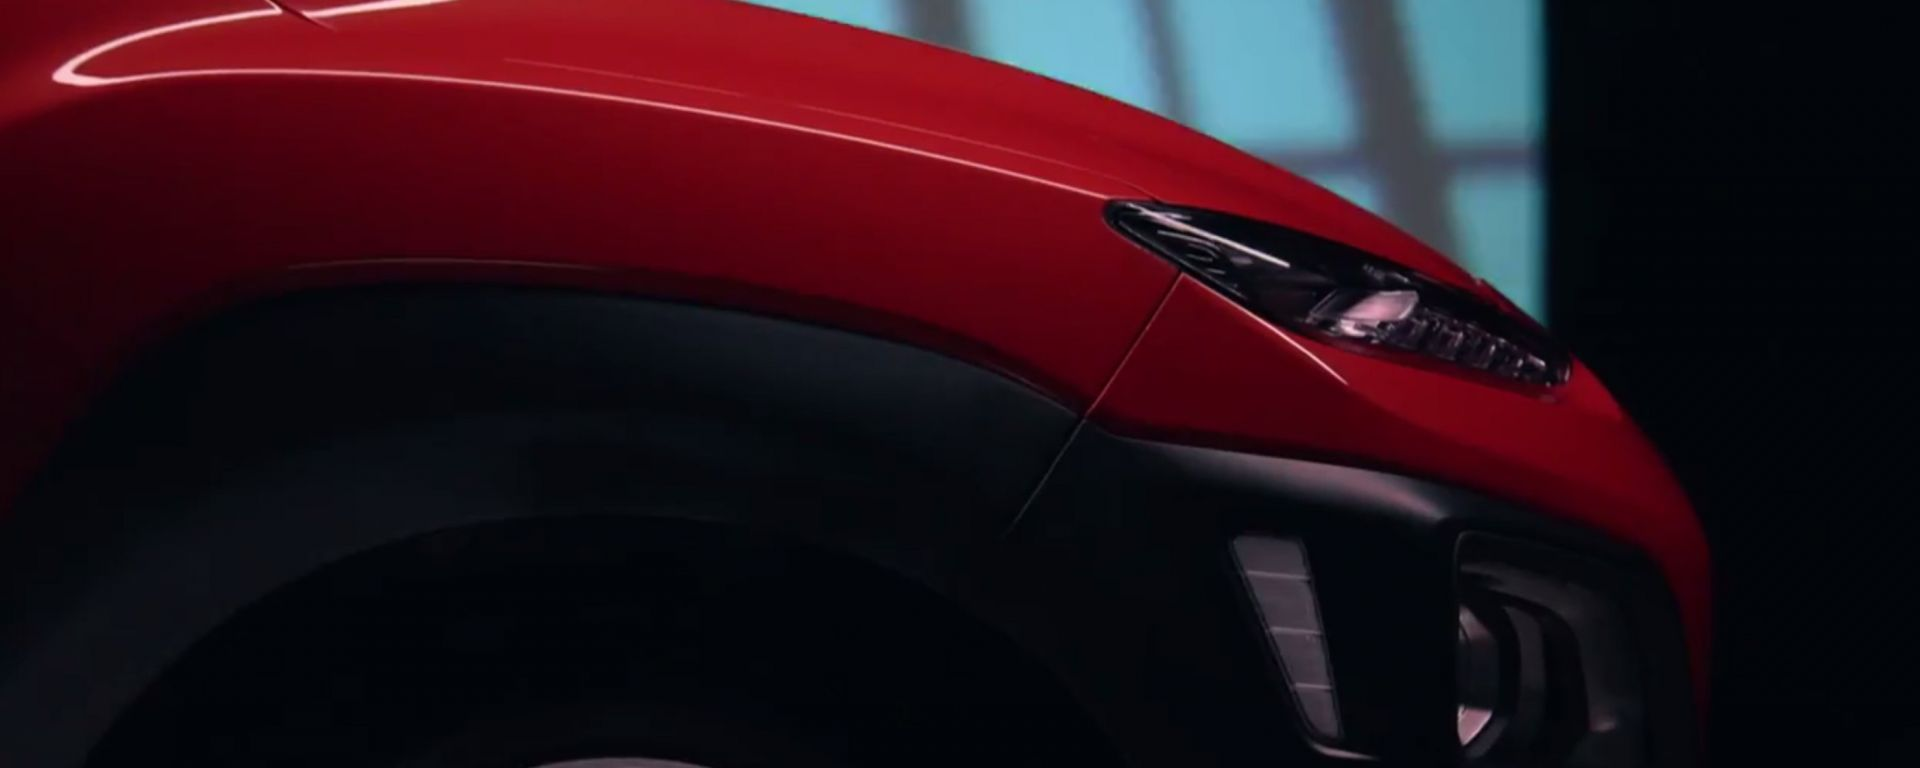 Hyundai Kona: i nuovi teaser del nuovo suv coreano